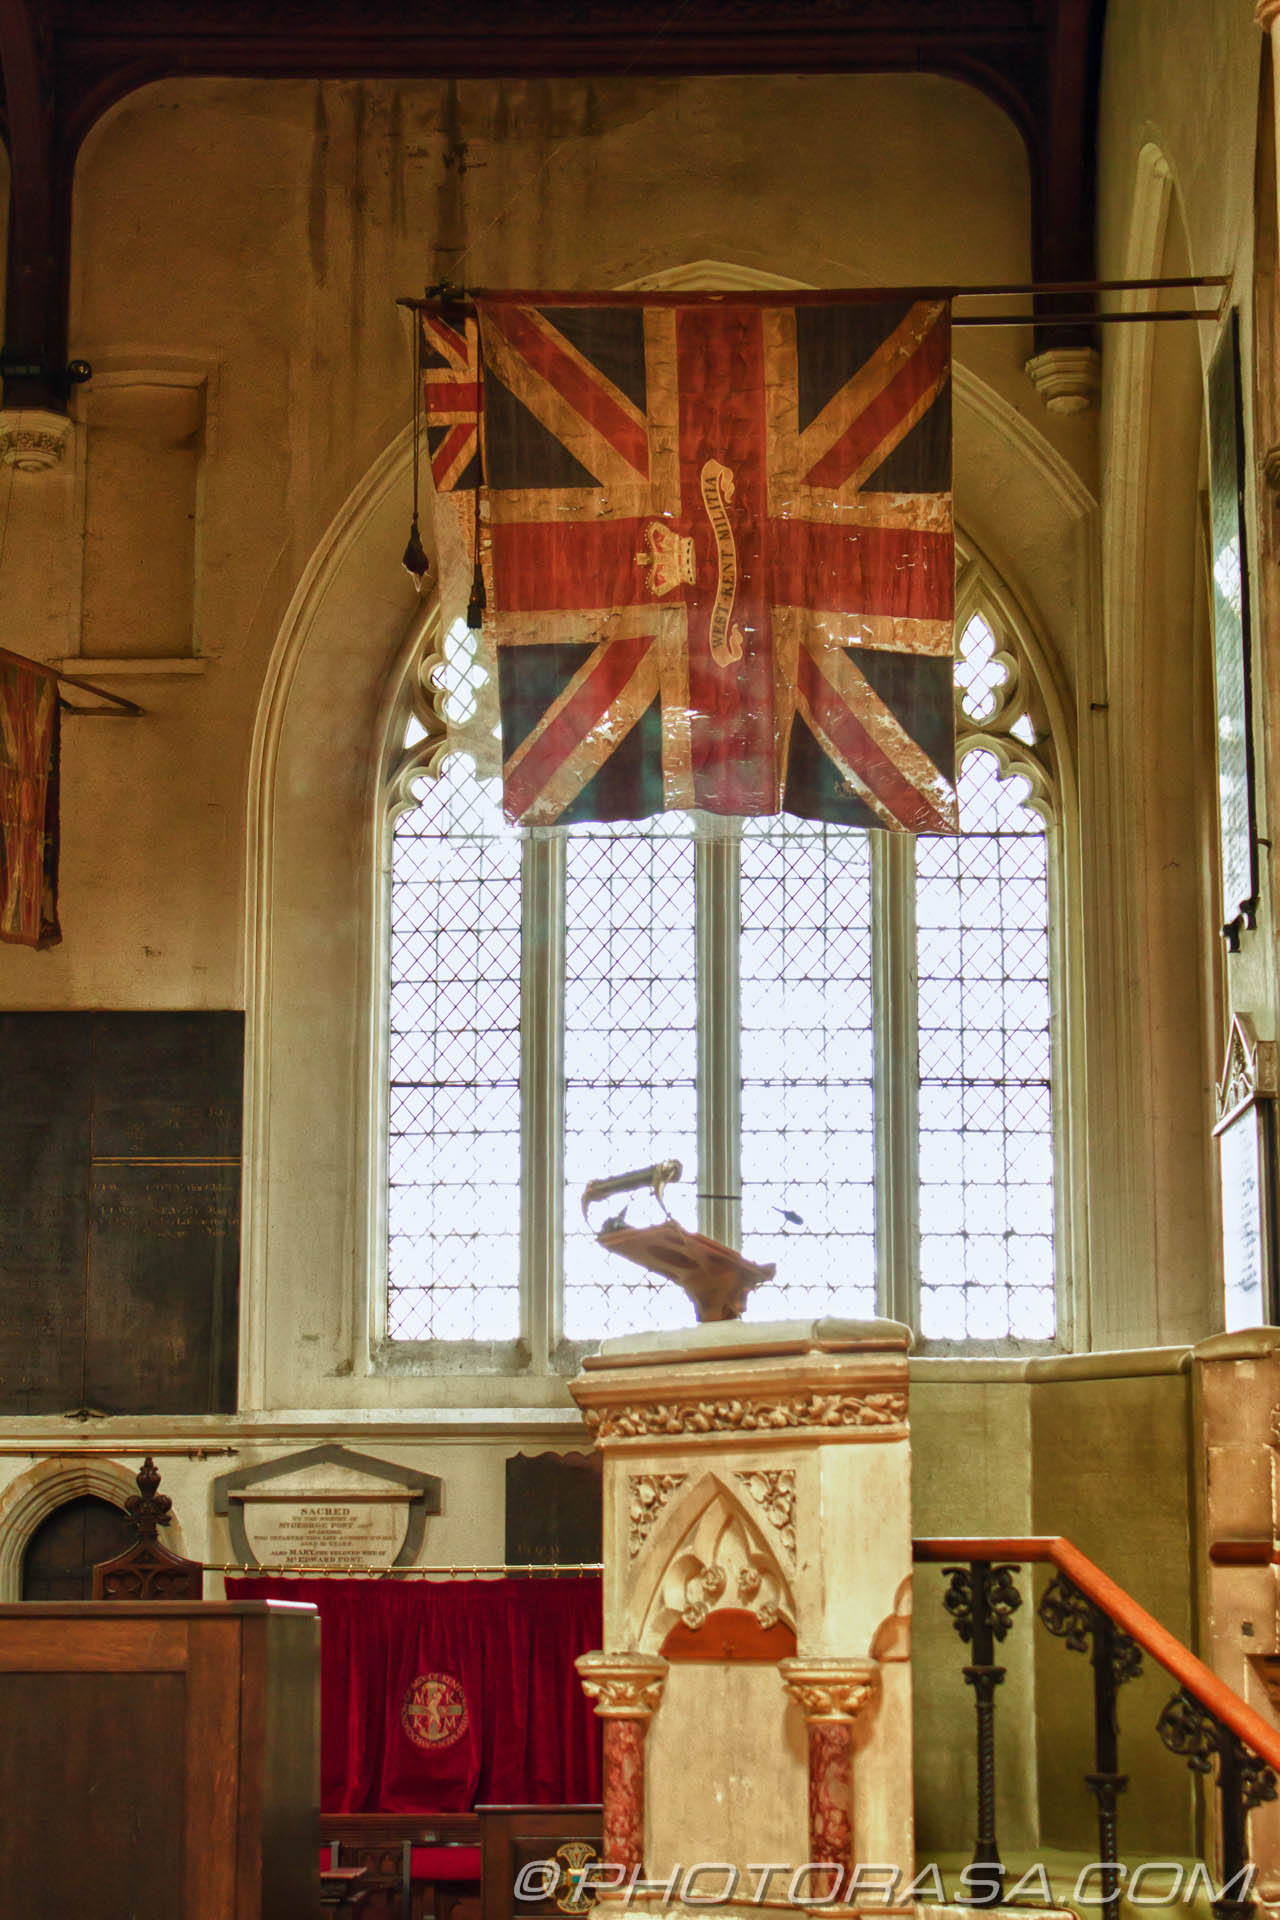 https://photorasa.com/inside-all-saints-church-in-maidstone/old-british-flag-in-church/